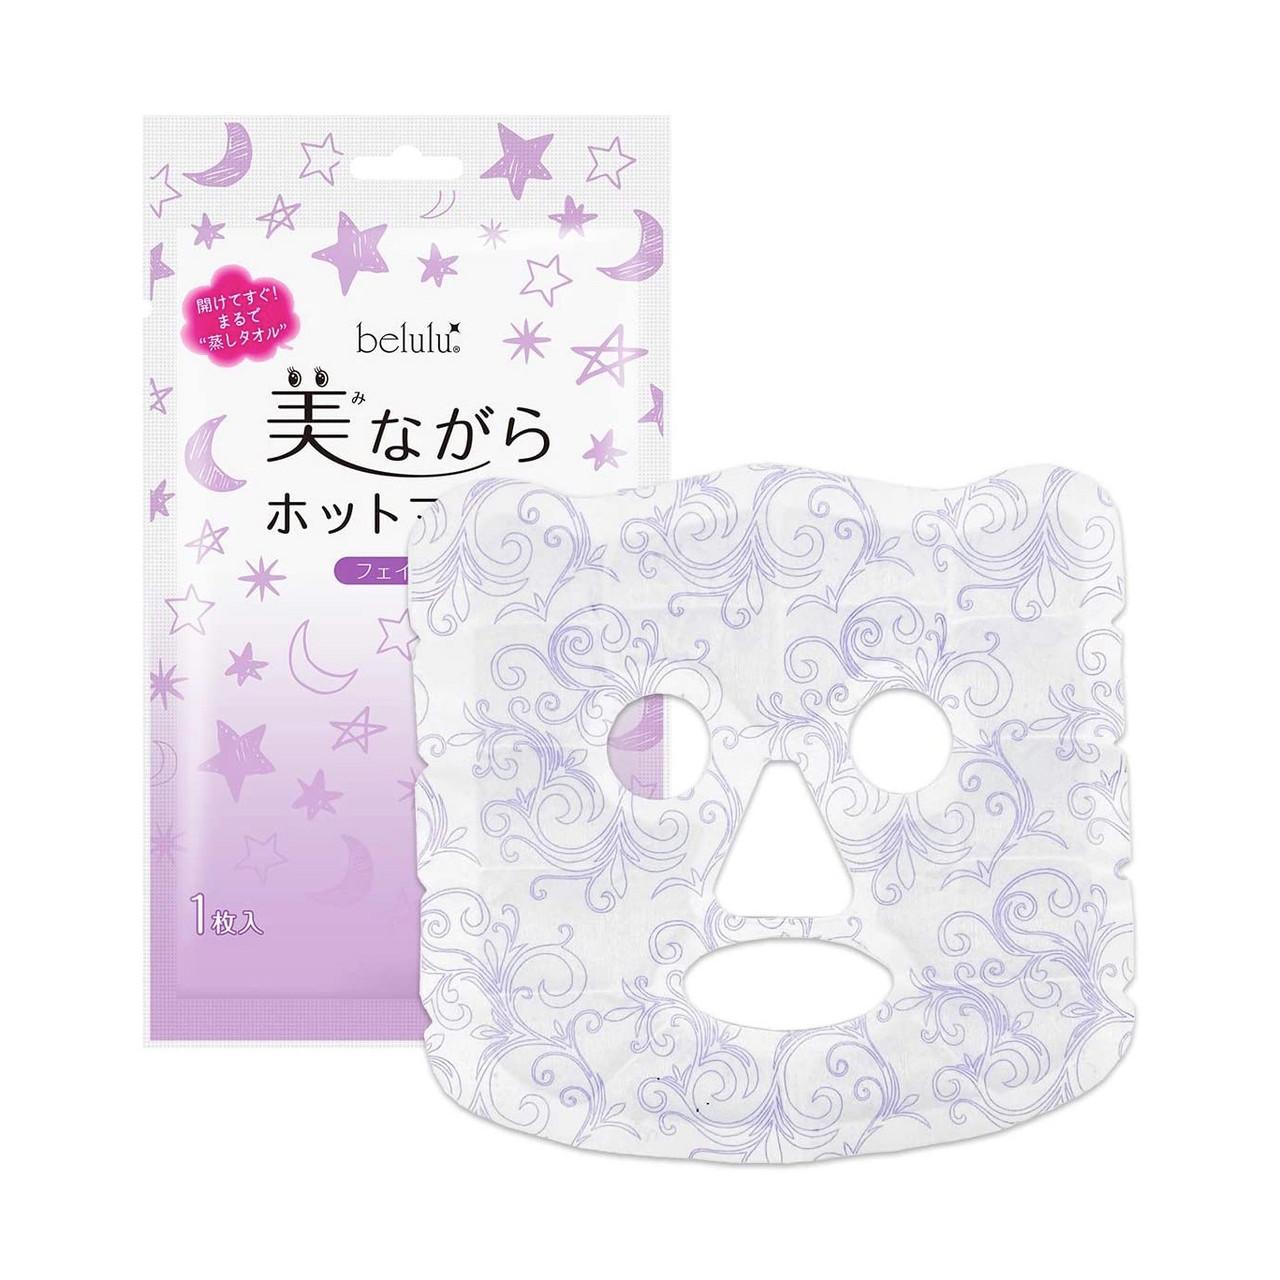 Belulu Minagara Hot Mask Паровая маска